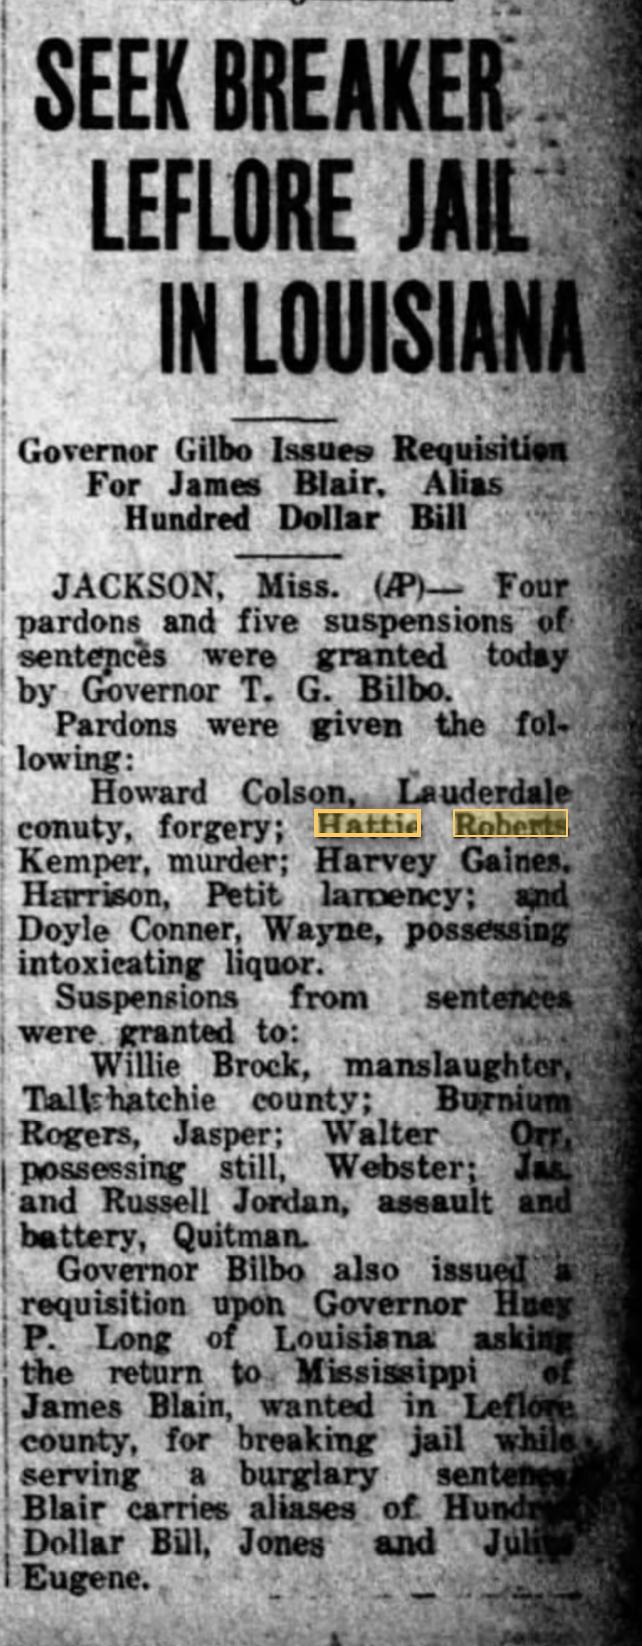 Hattie Roberts 5-18-1931